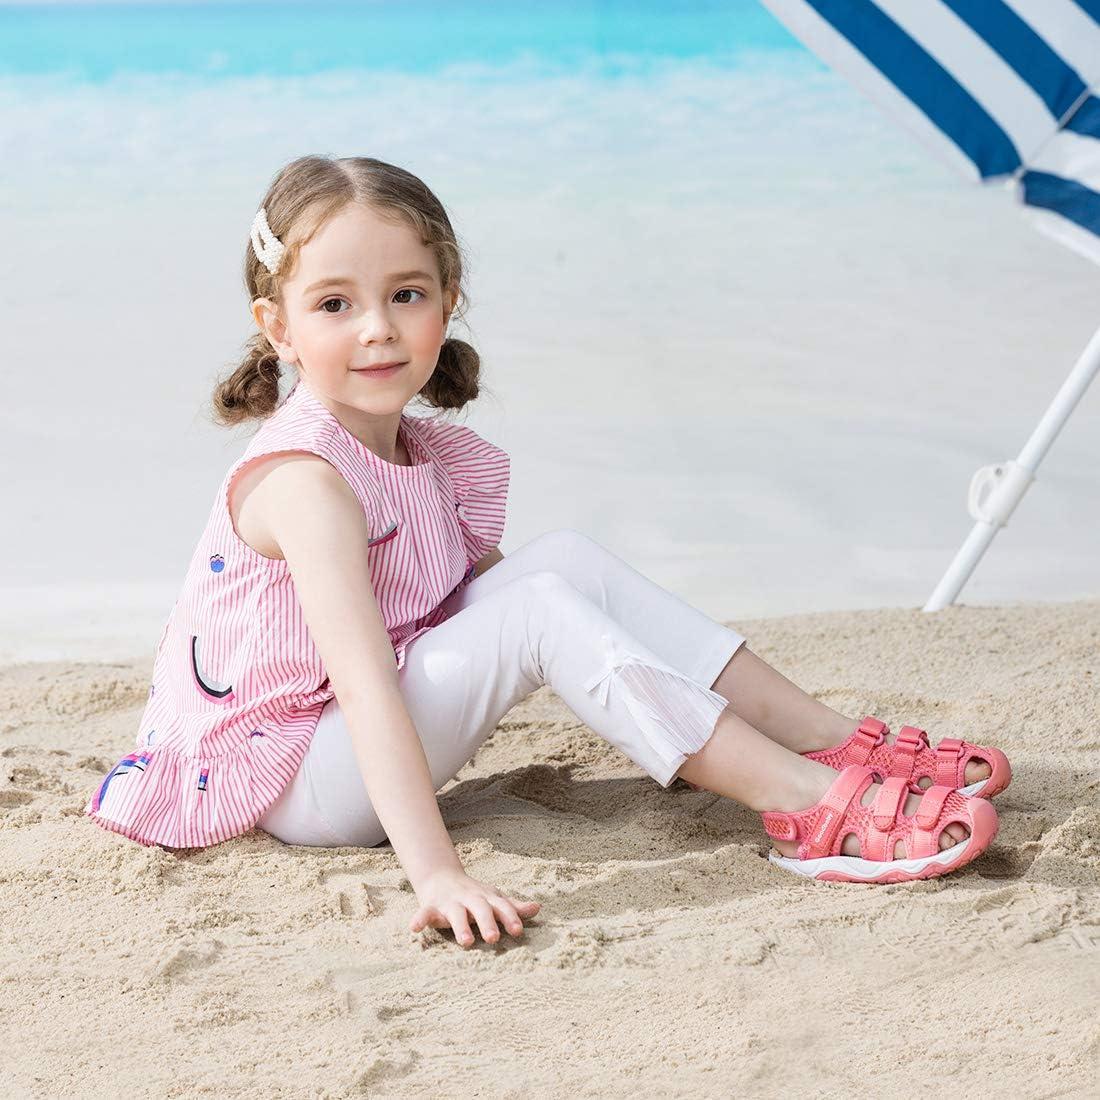 Toddler//Little Kids BMCiTYBM Boys Girls Sport Sandals Closed Toe Water Hiking Beach Outdoor Shoes